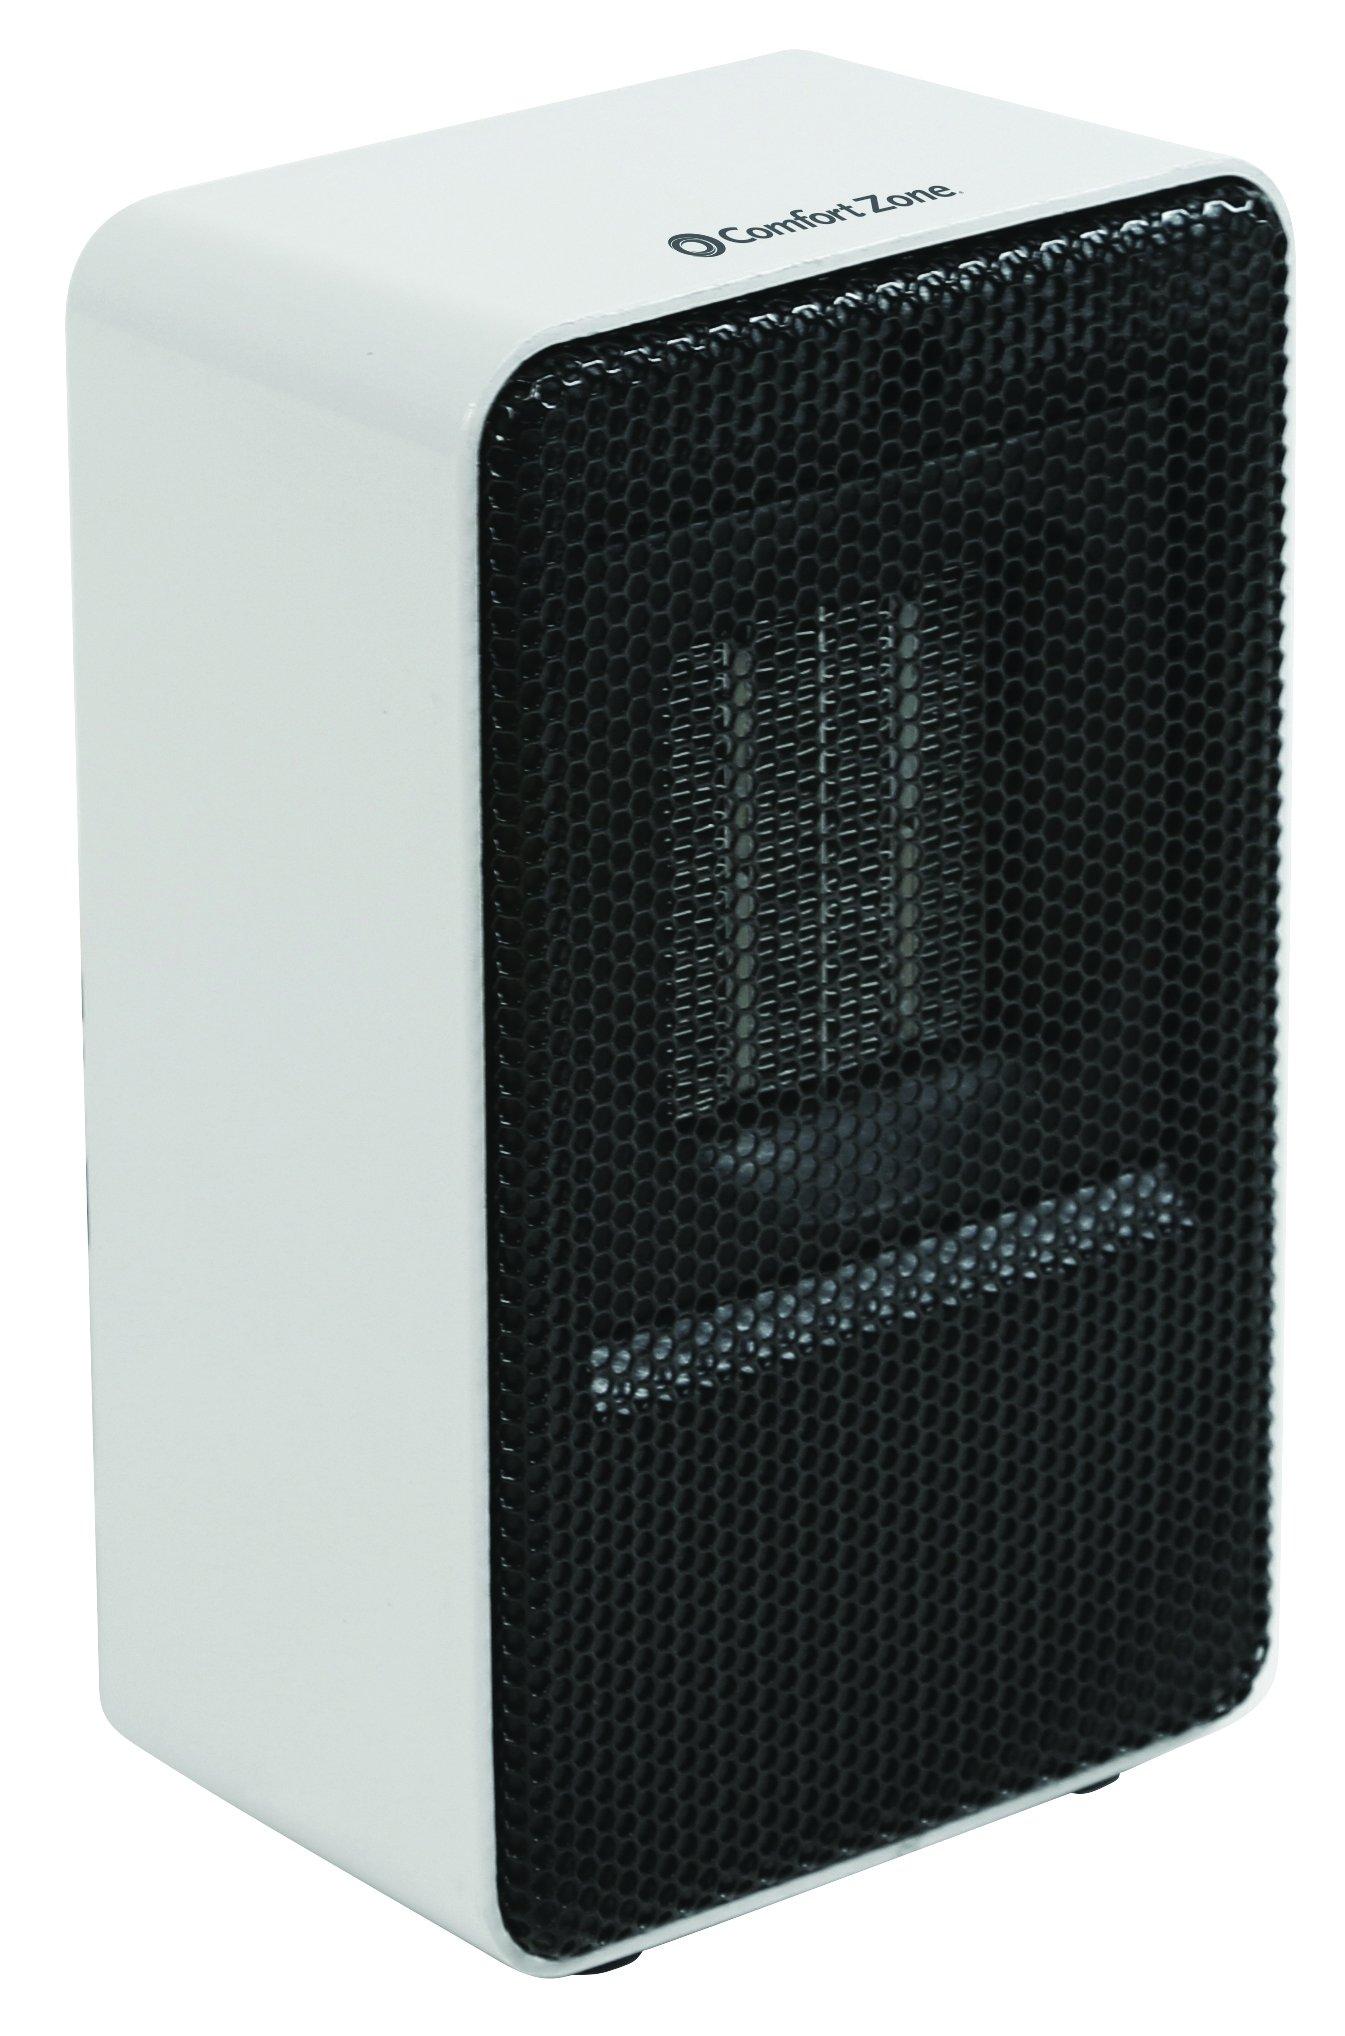 Comfort Zone Personal Ceramic Heater, White